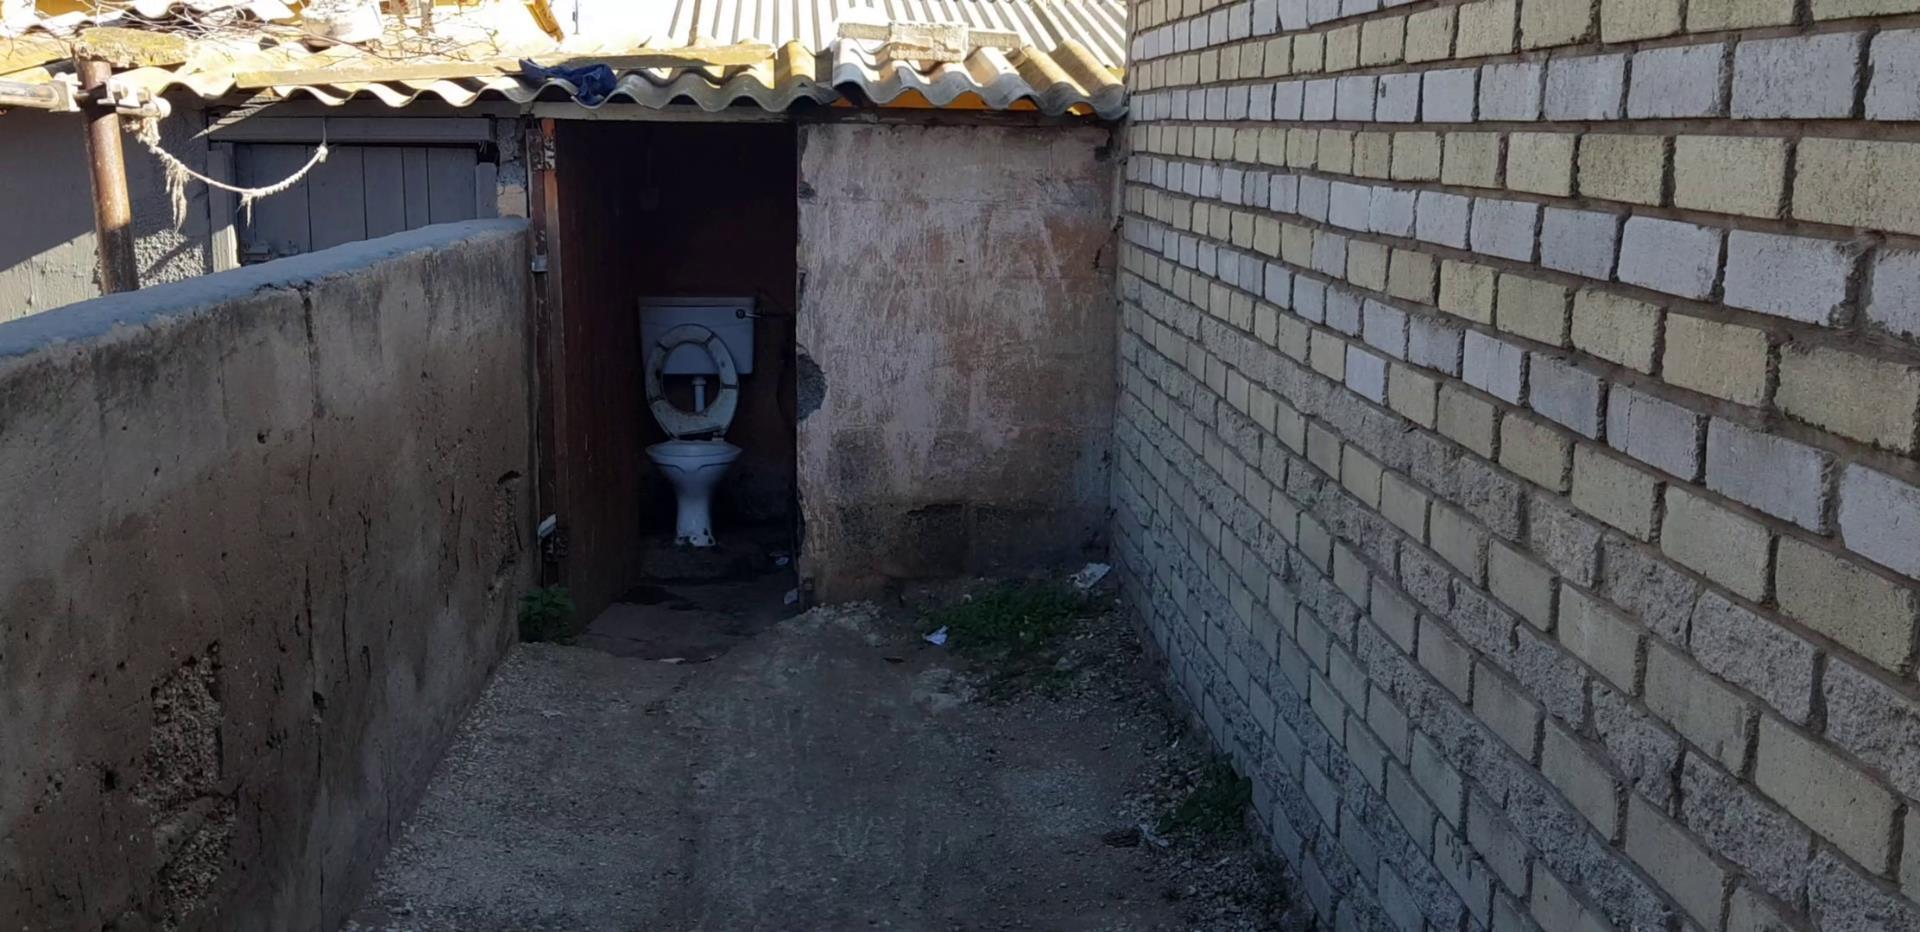 8 Bedroom House For Sale in Kwazakhele